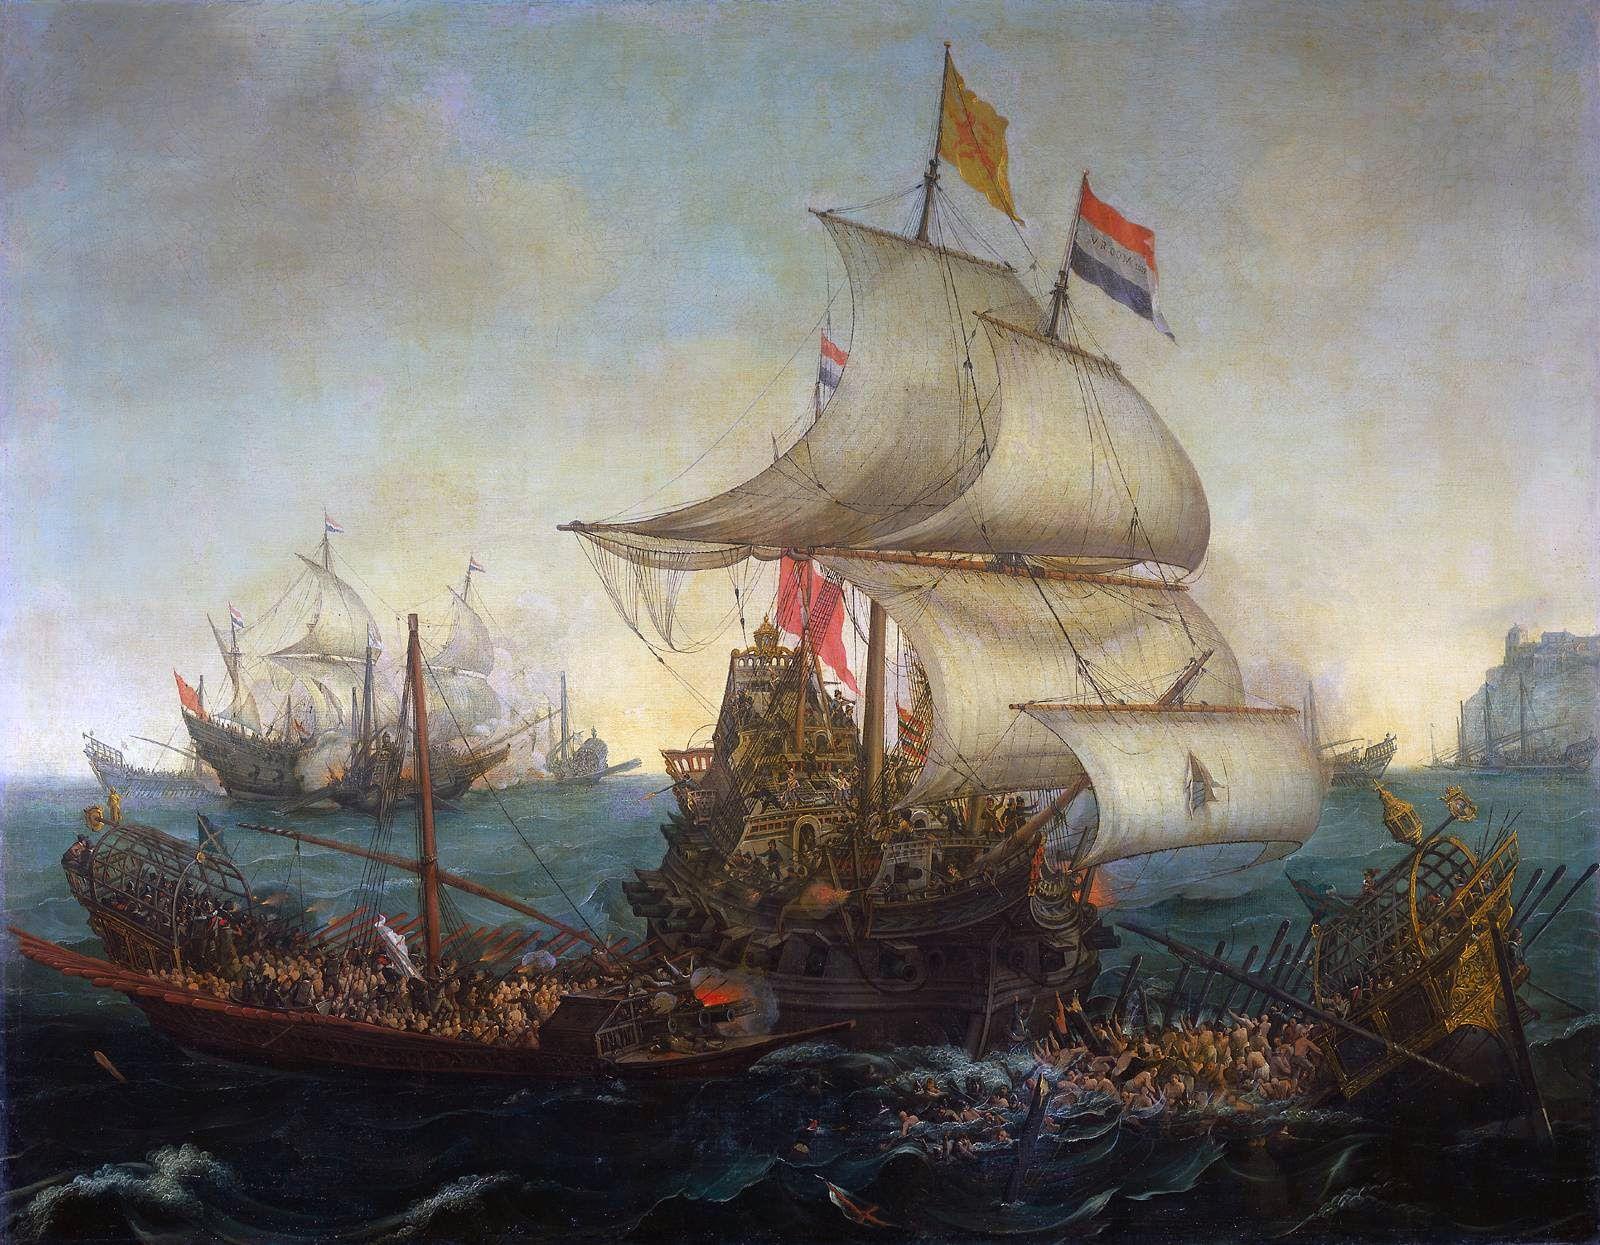 Pin By Ruben Kuipers On V O C Dutch Ships Nautical Art Maritime Painting